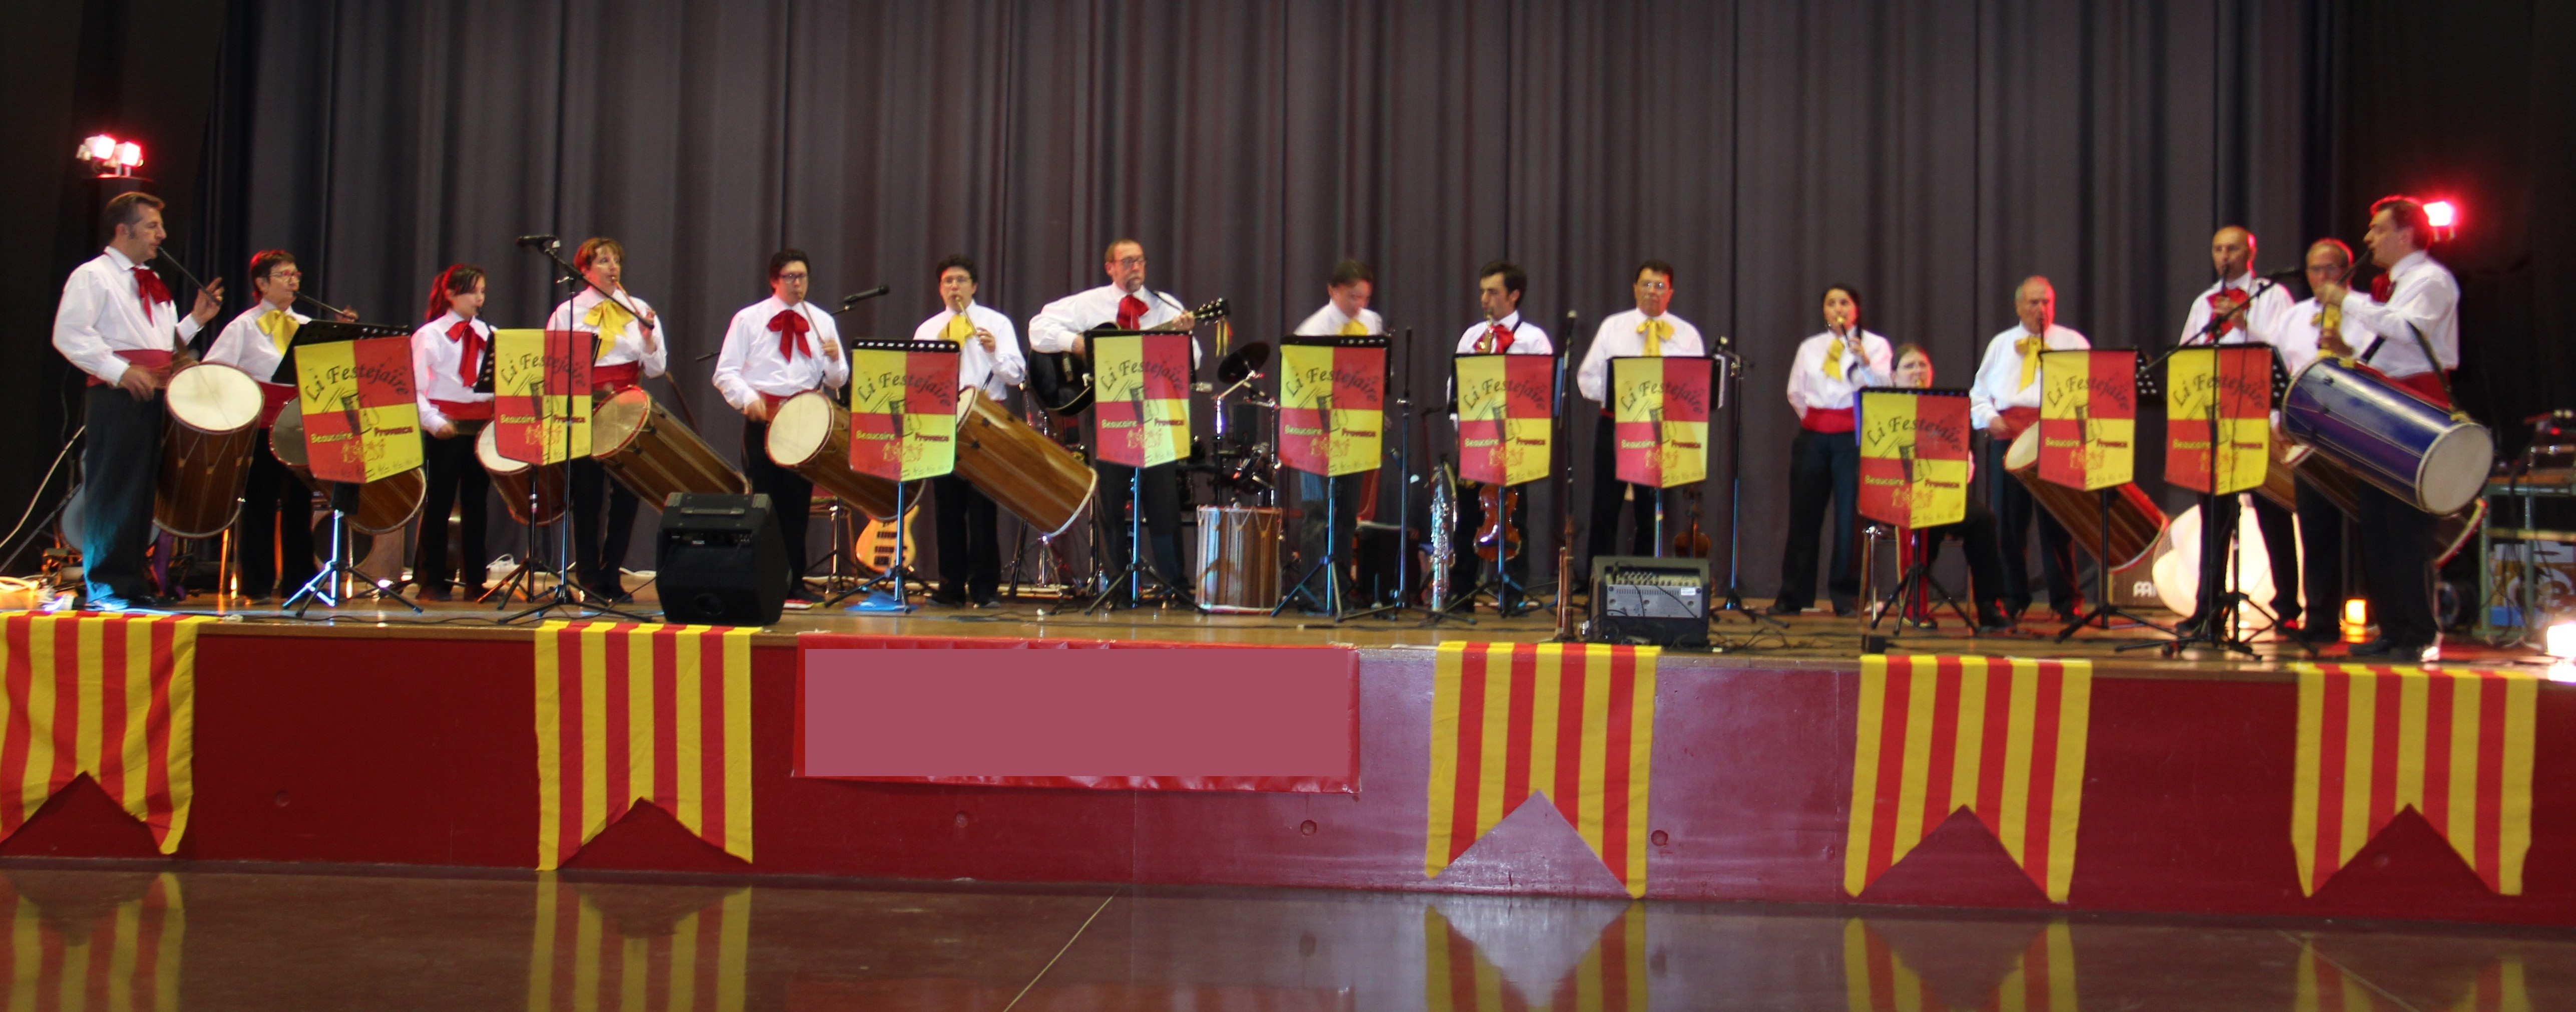 Concert / Spectacle / Balèti